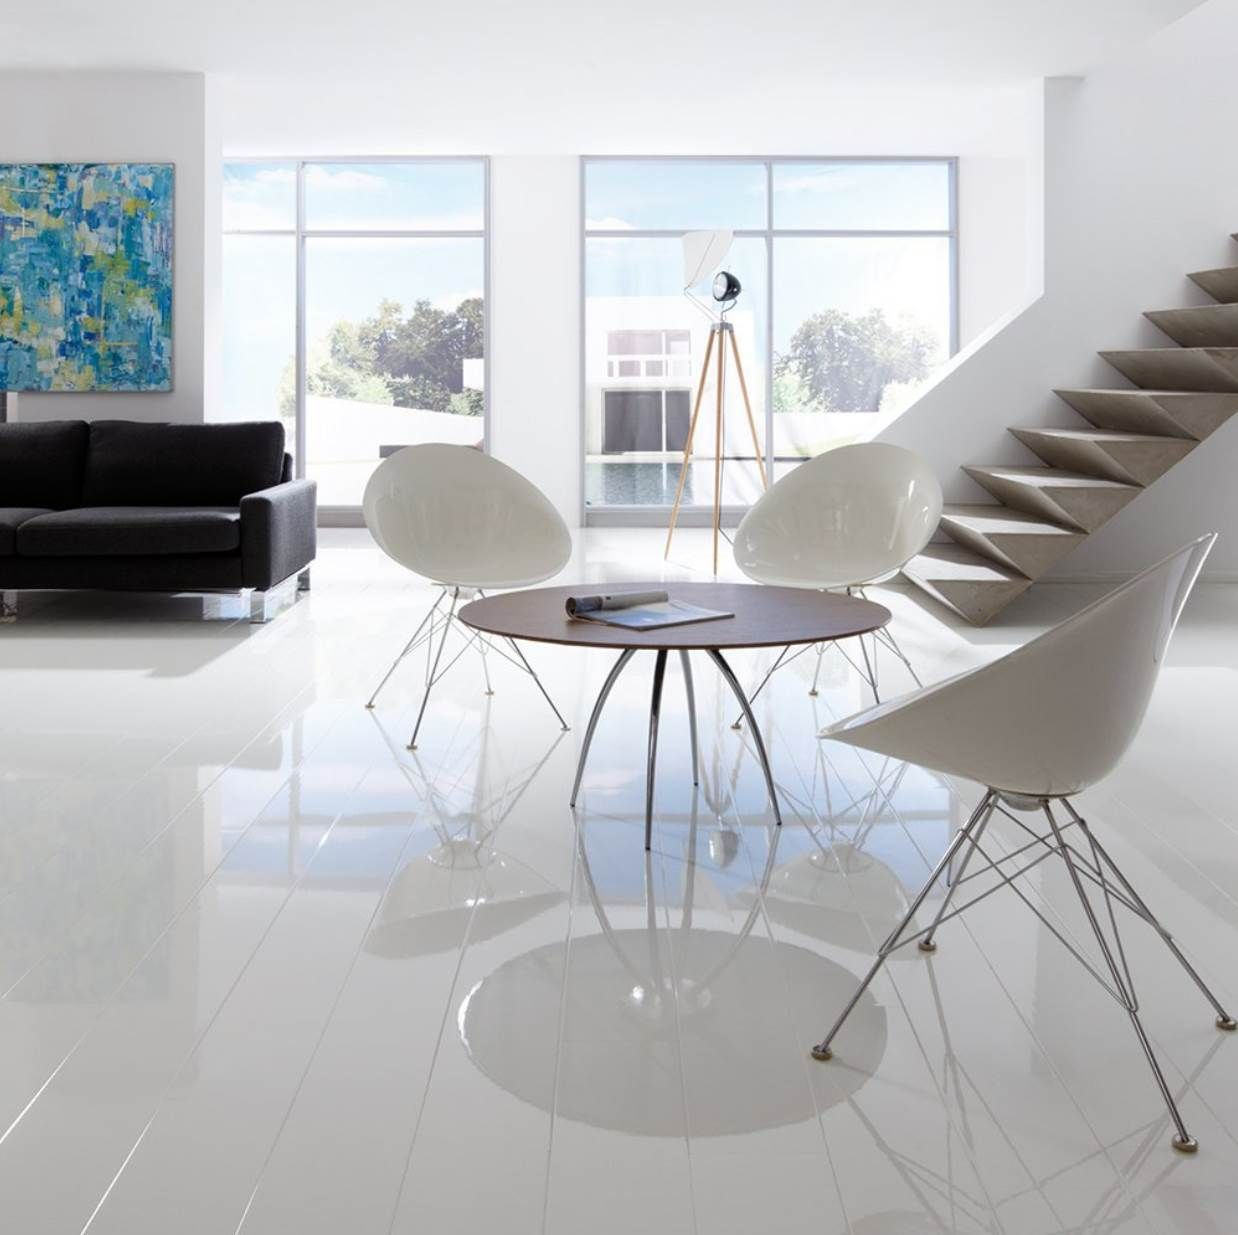 Elesgo Super Gloss White Laminate Flooring 772316 Sample White Laminate Flooring White Laminate High Gloss Floors